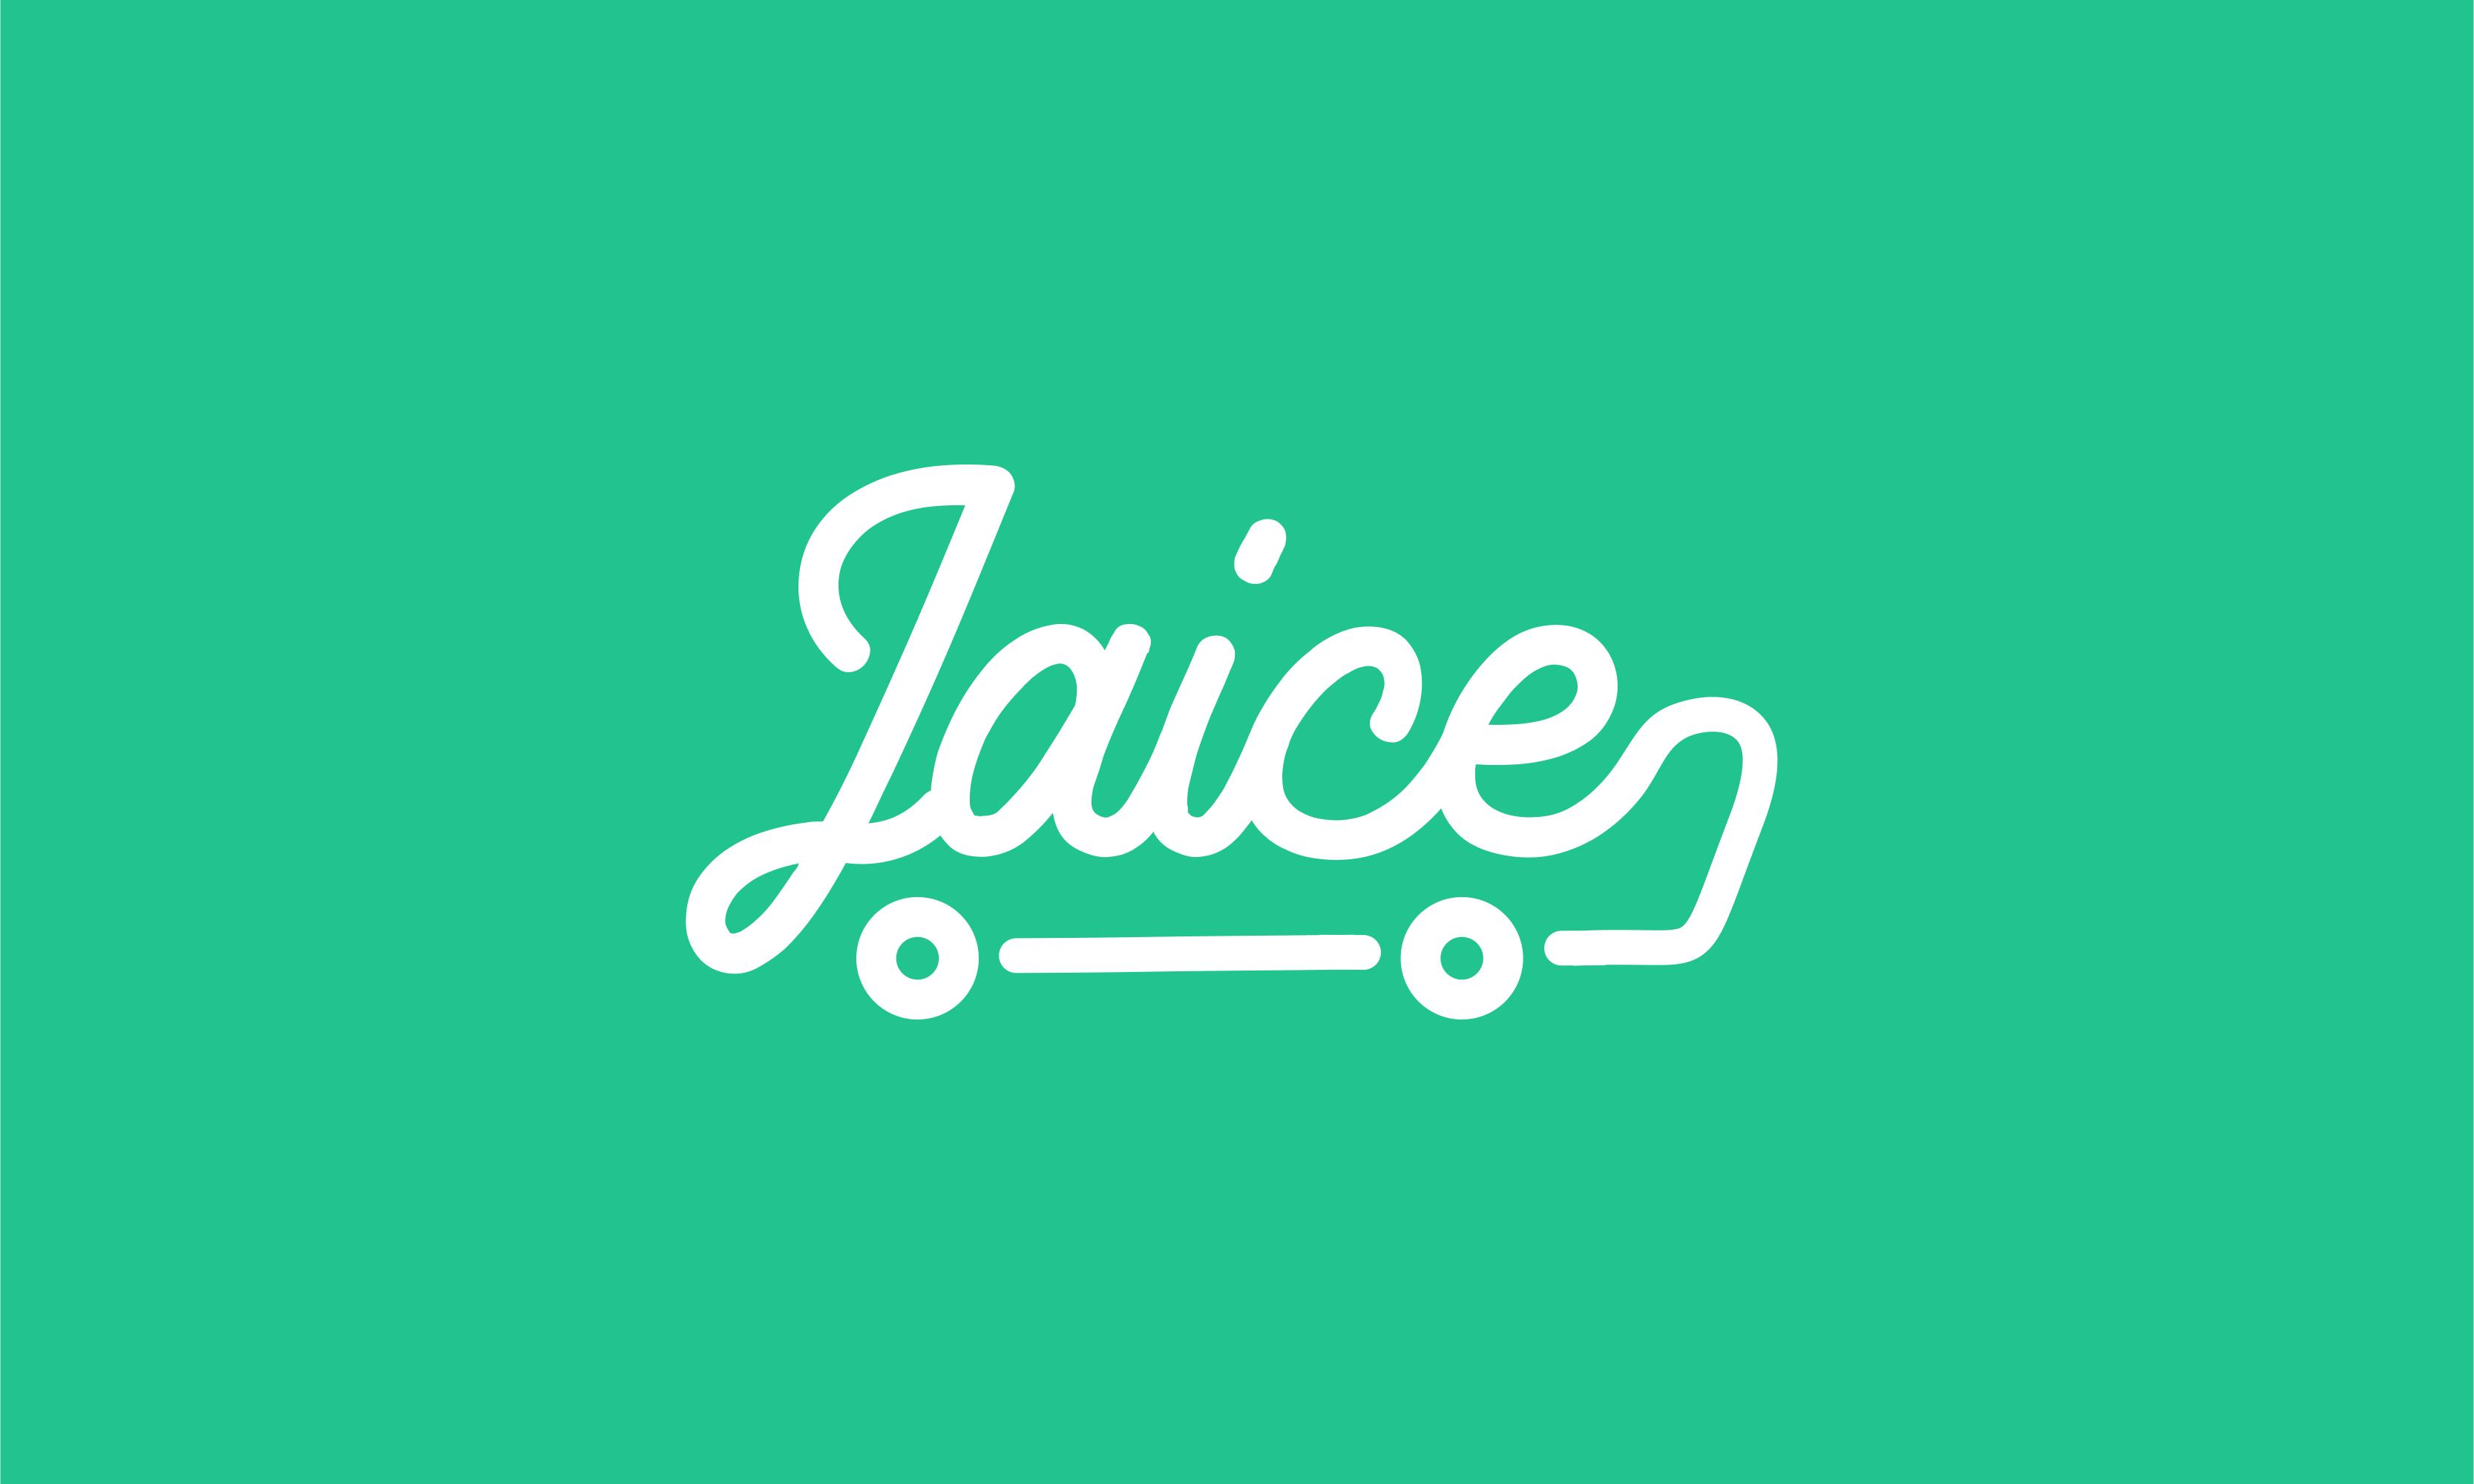 Jaice